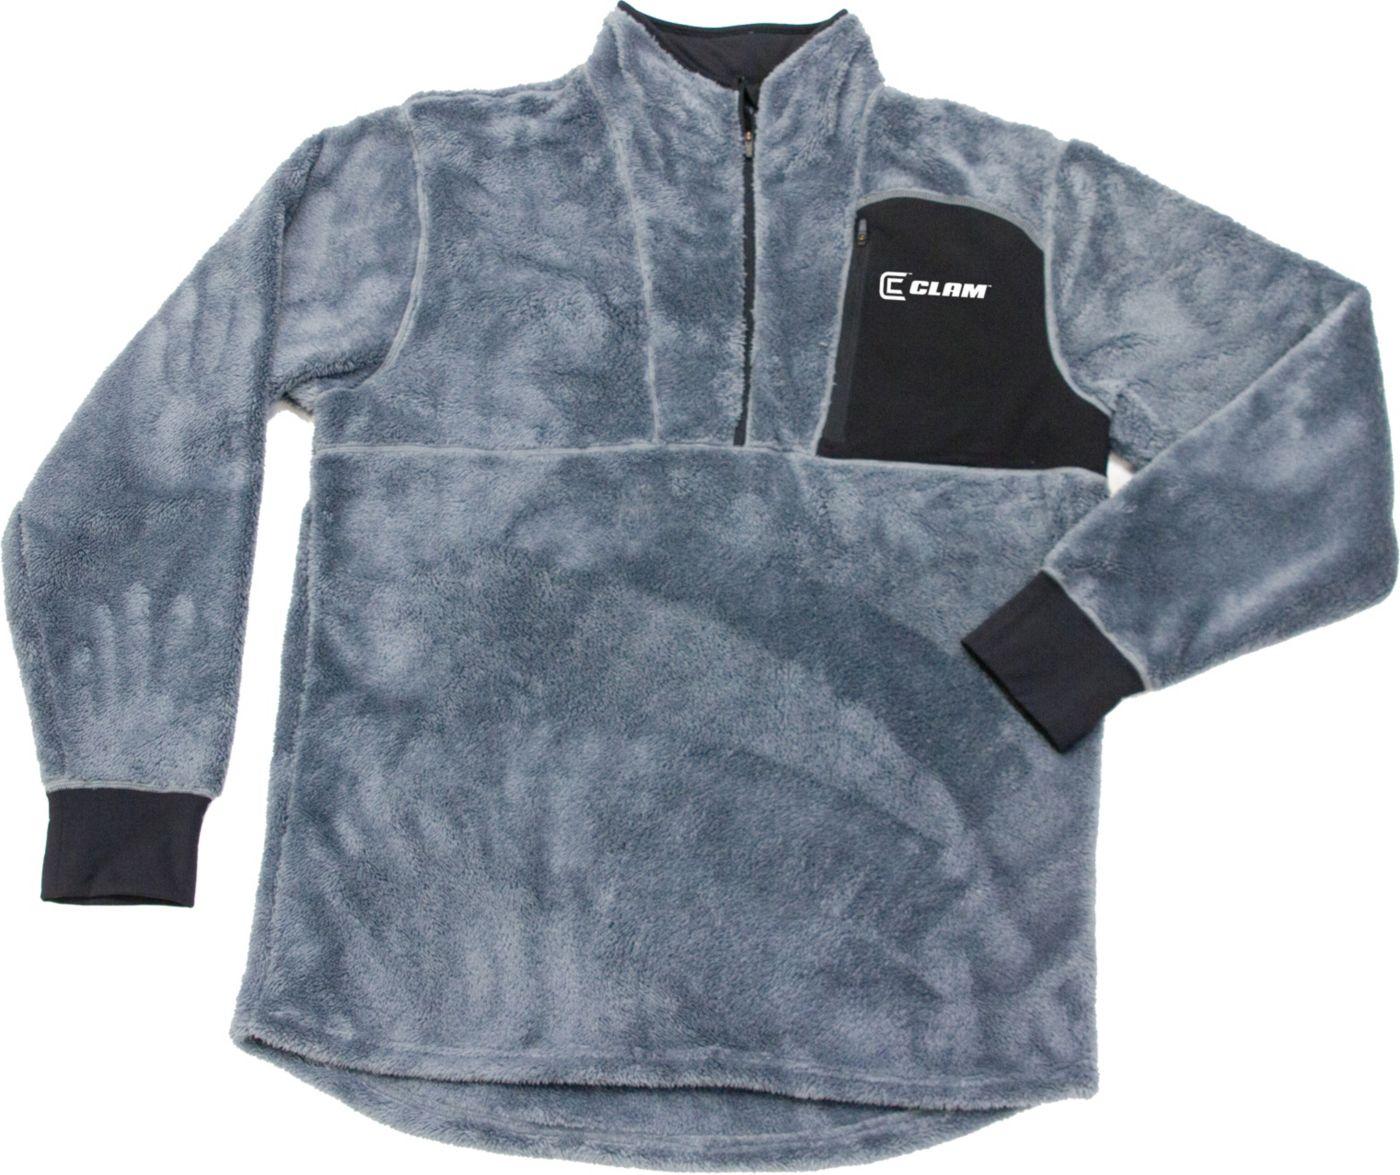 Clam Men's IceArmor Sub Zero Base Layer Shirt